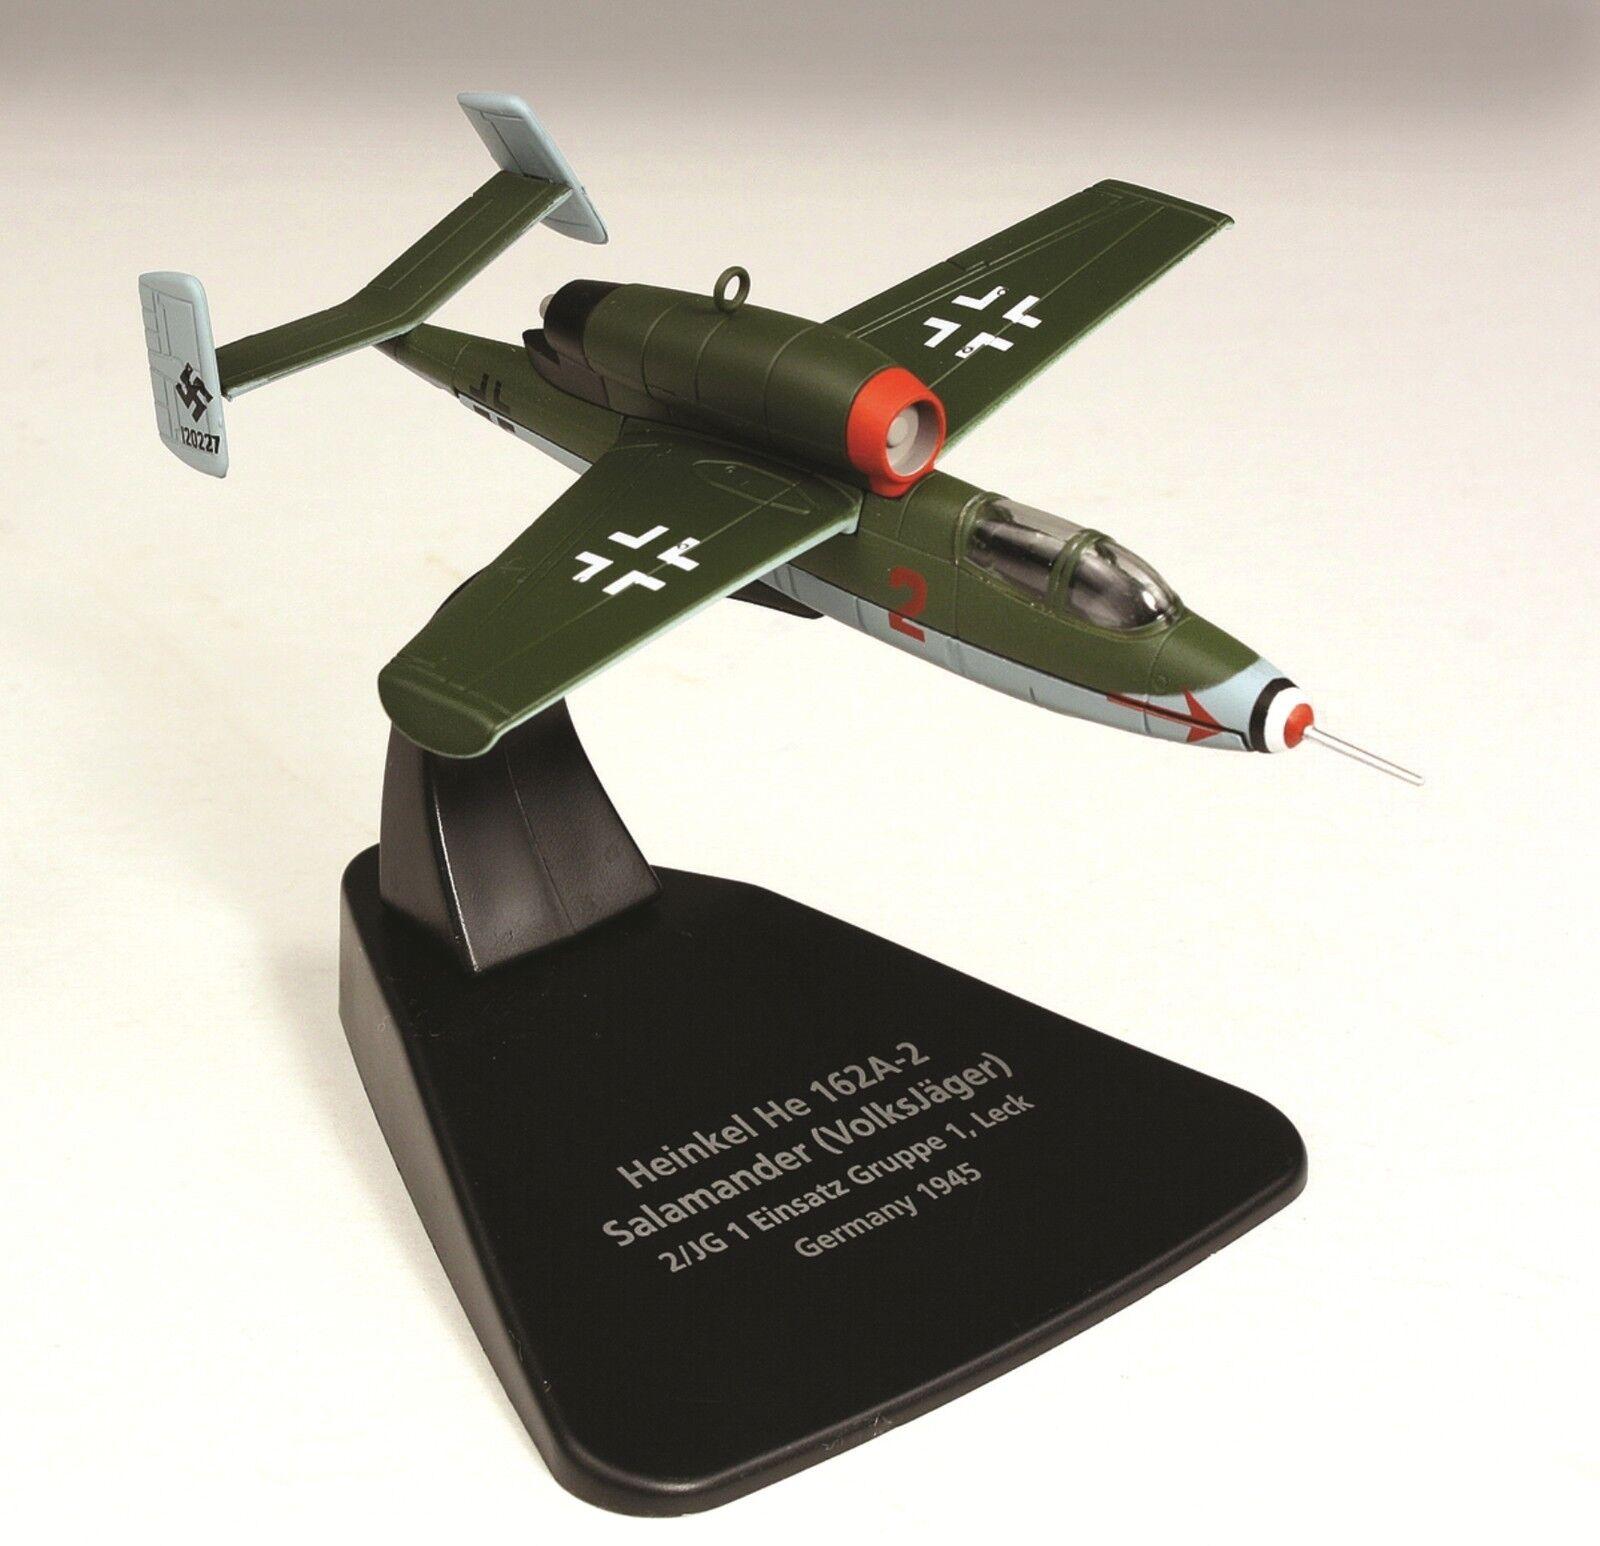 Oxford 1 72 Heinkel He 162 Salamander Luftwaffe II JG 1 Germany 1945 AC019